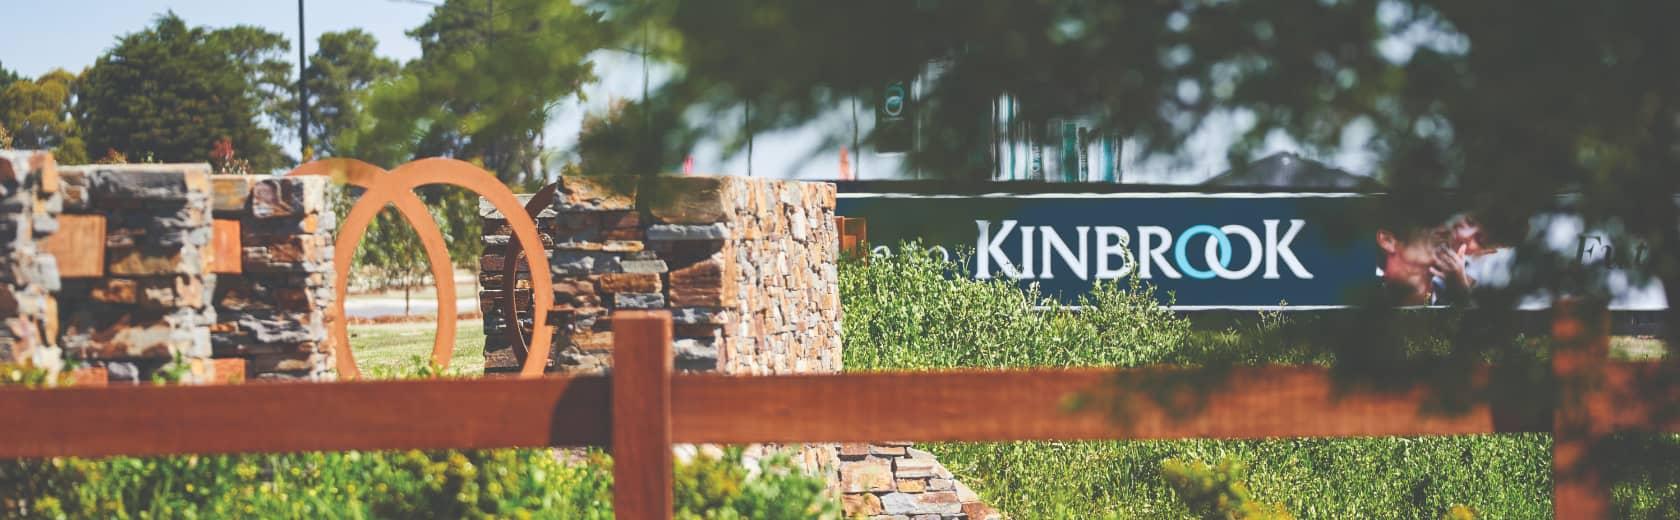 Kinbrook – Donnybrook